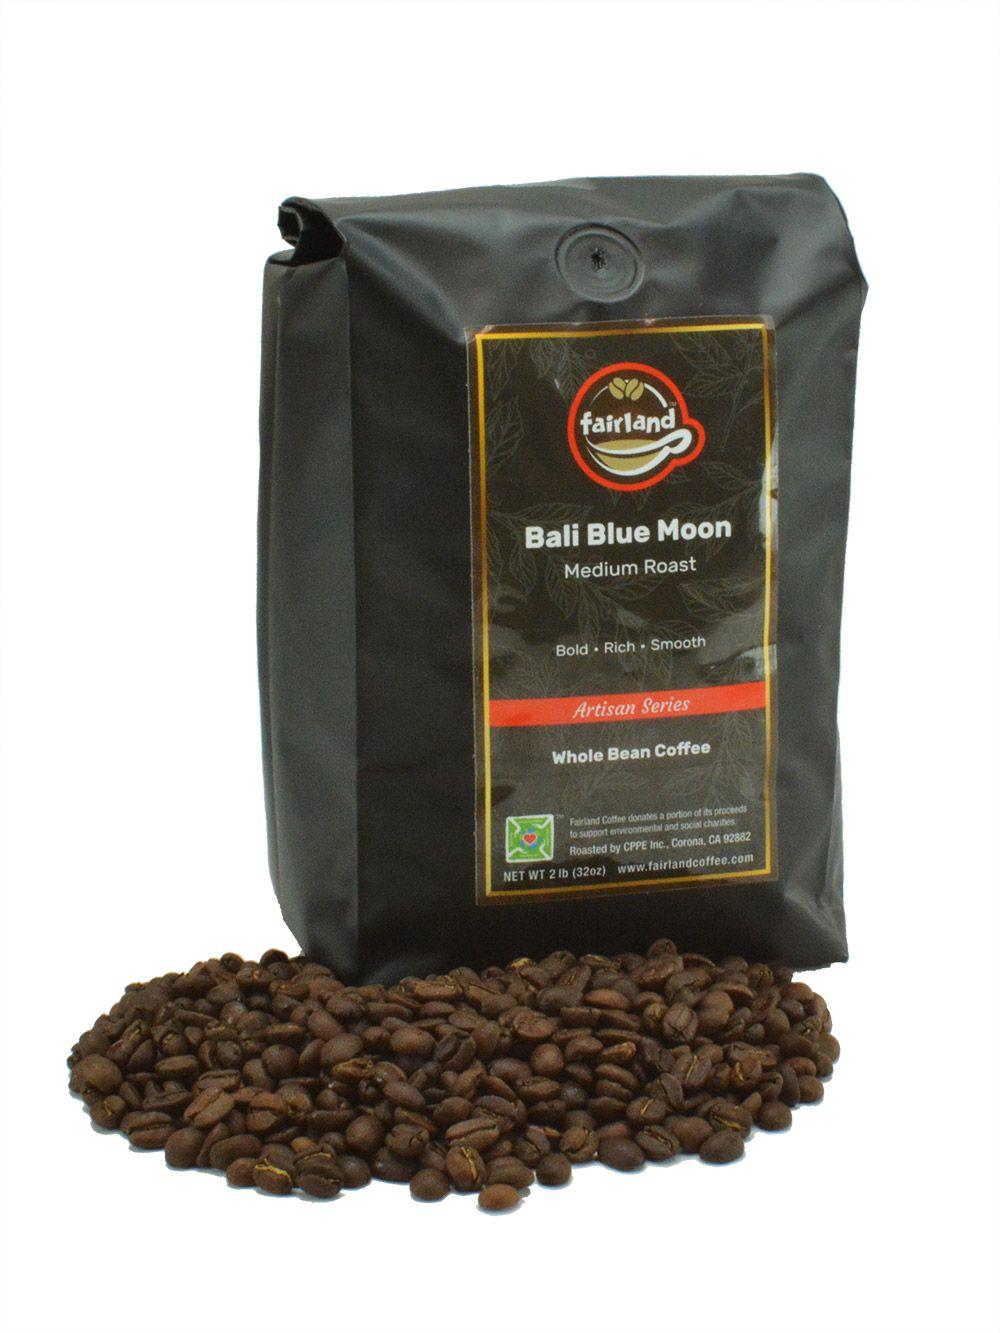 Fairland coffee bali blue moon rain forest alliance